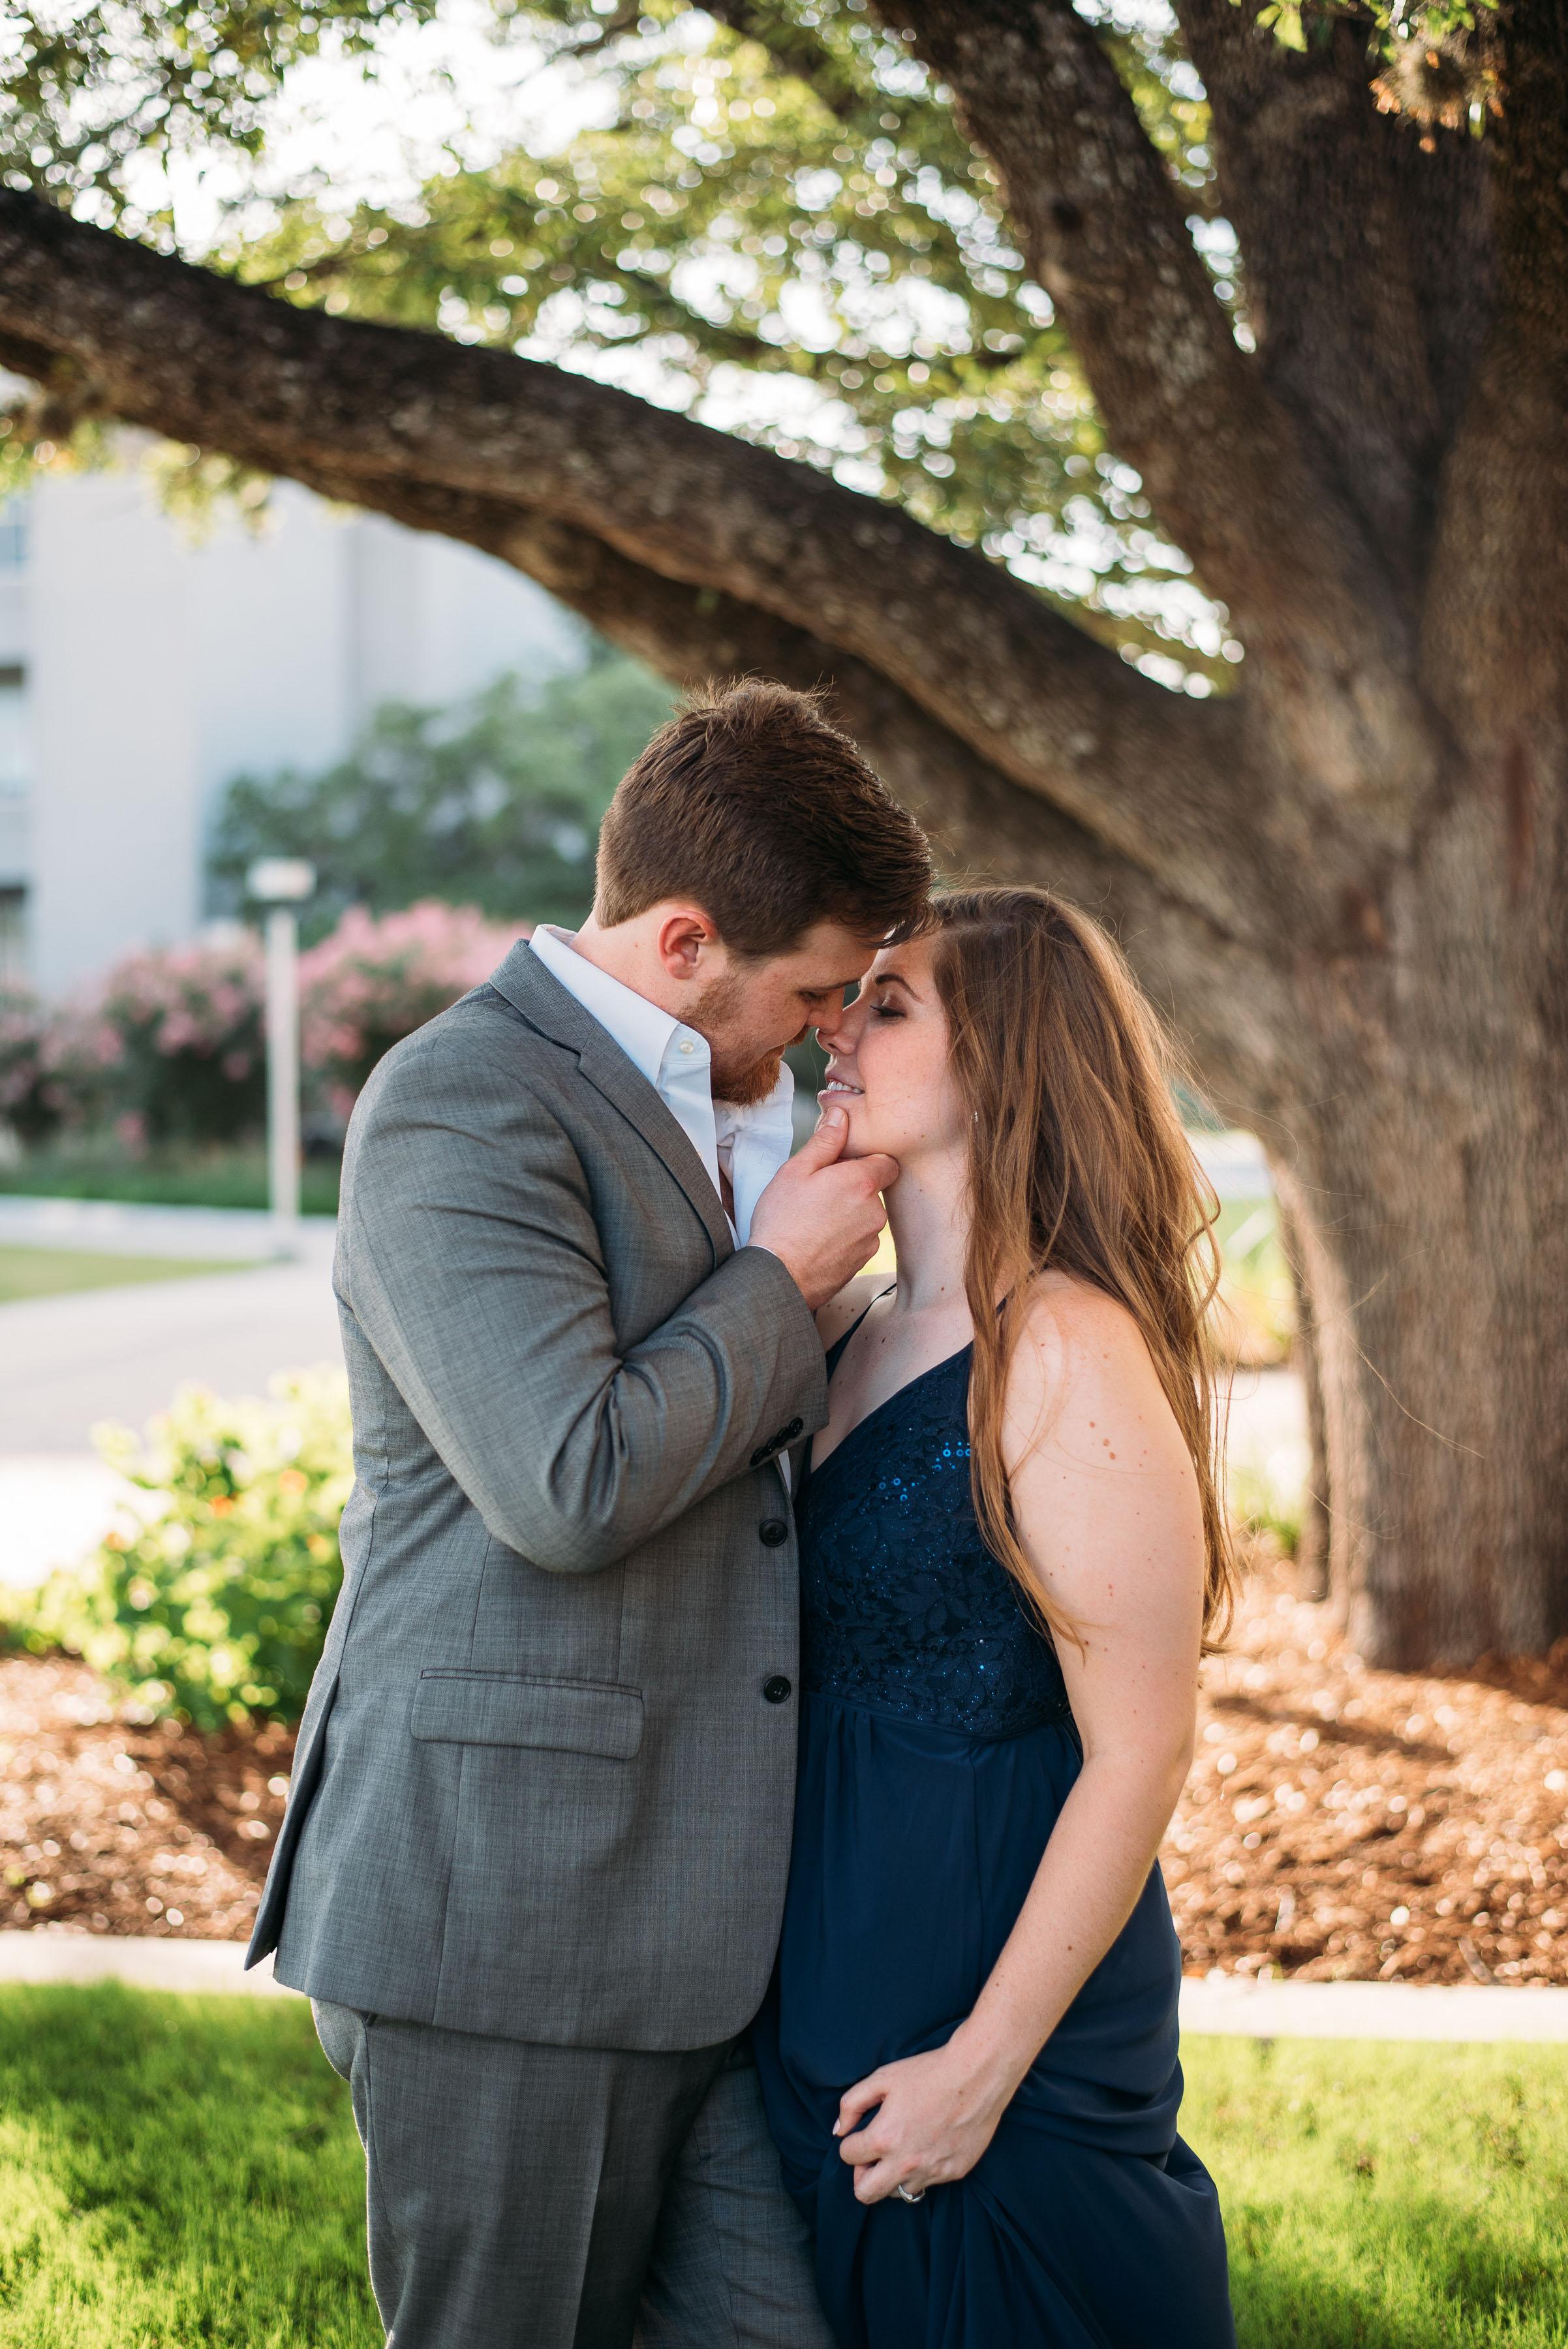 Texas-A&M-University-Engagement-College-Station-Wedding-Photographer-San-Angel-Photo-Mark-Johanna-Century-Tree-14.jpg